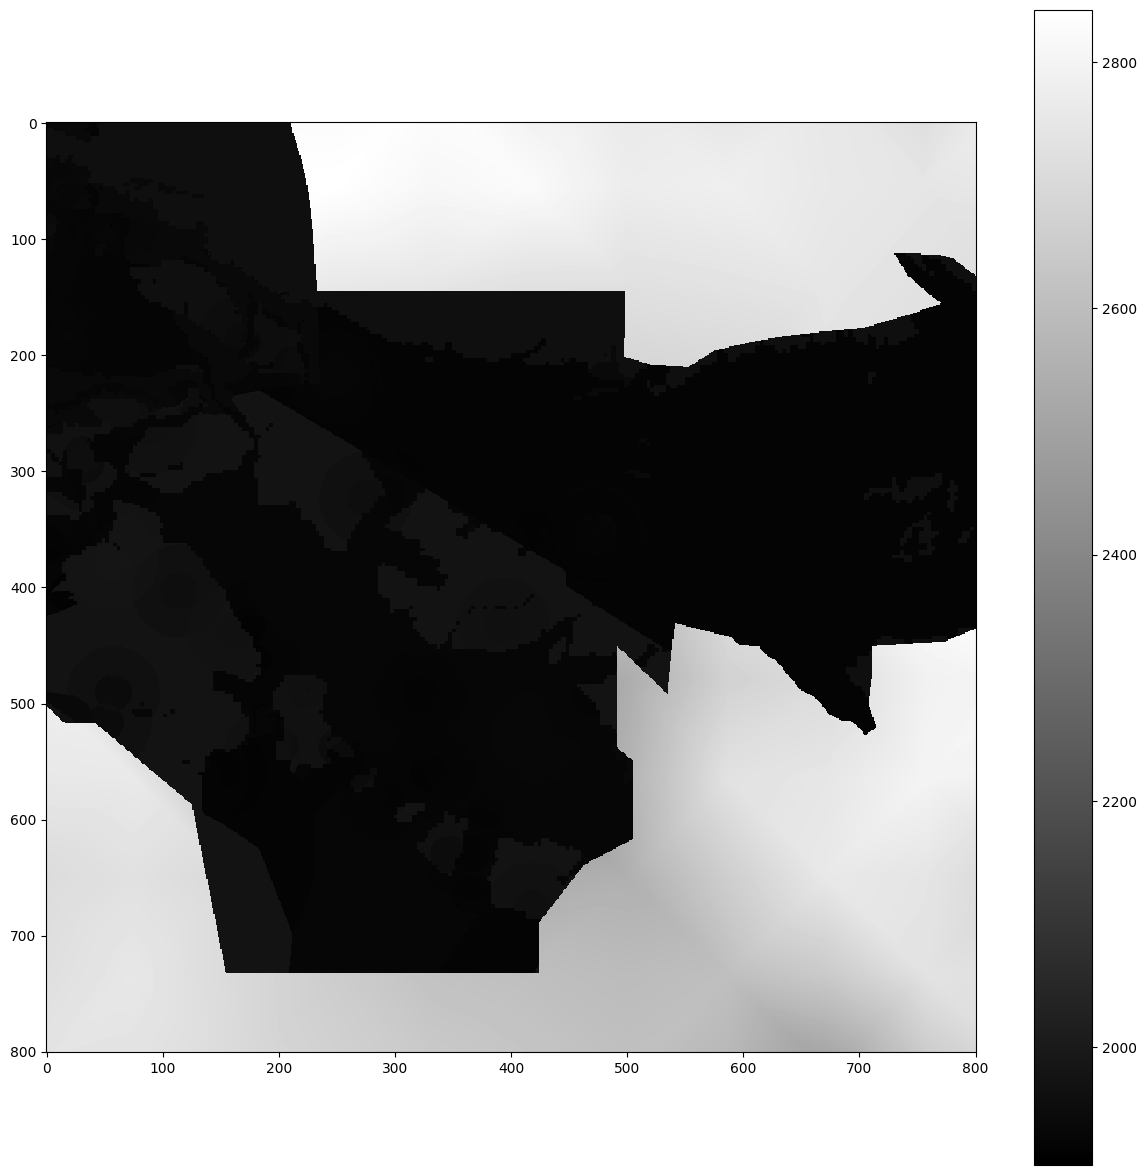 bench/seismic/wp/la_habra/meshes/velocity_model/plots/rho_0.png